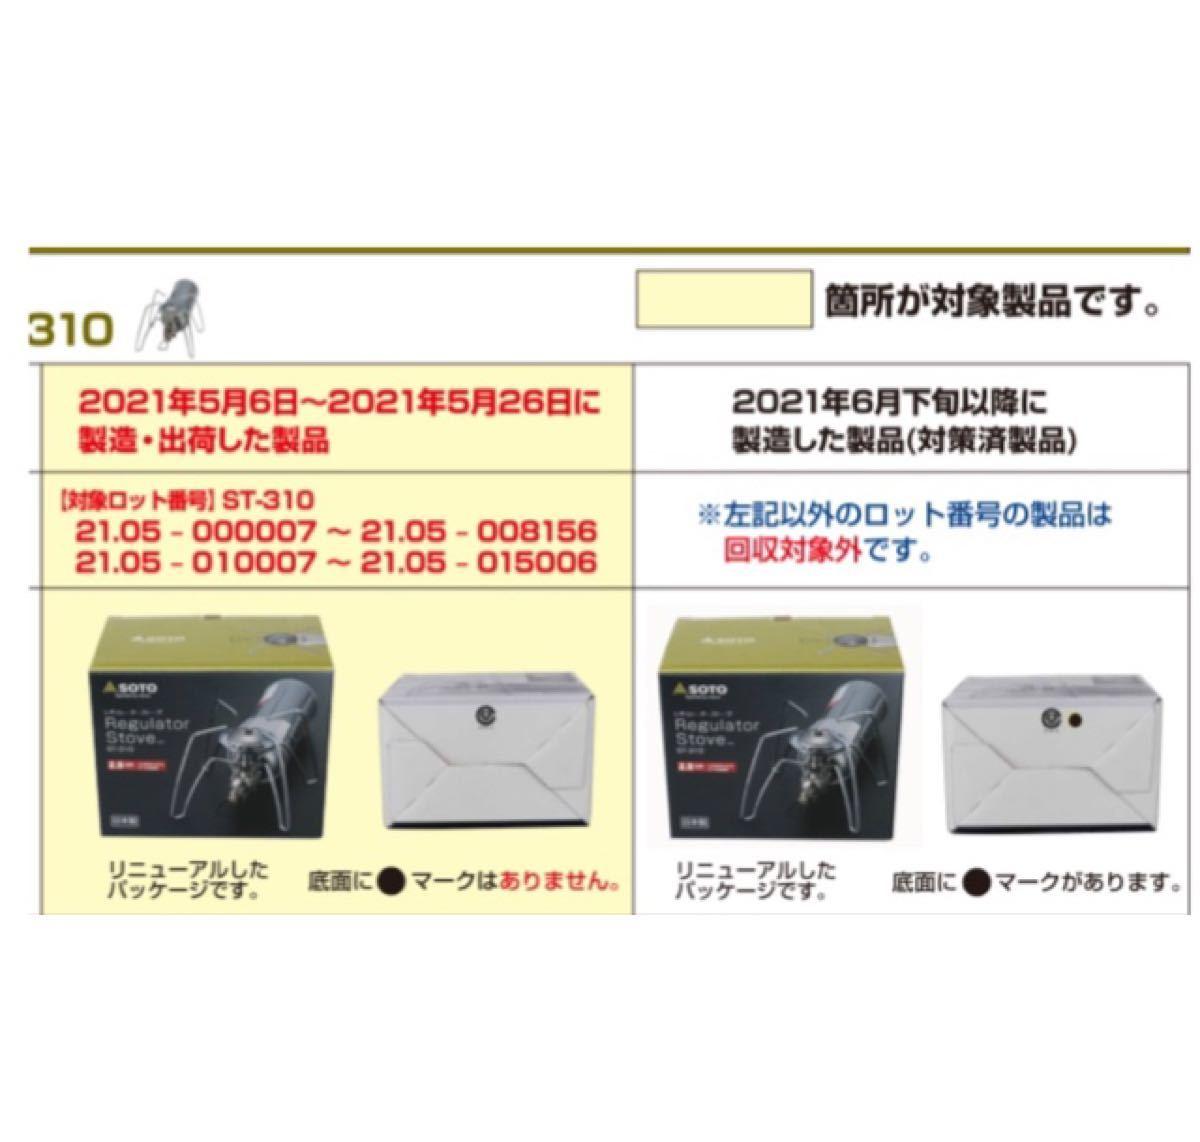 SOTO レギュレーターストーブ ST-310 新富士バーナー 新品未開封 リコール対象外製品